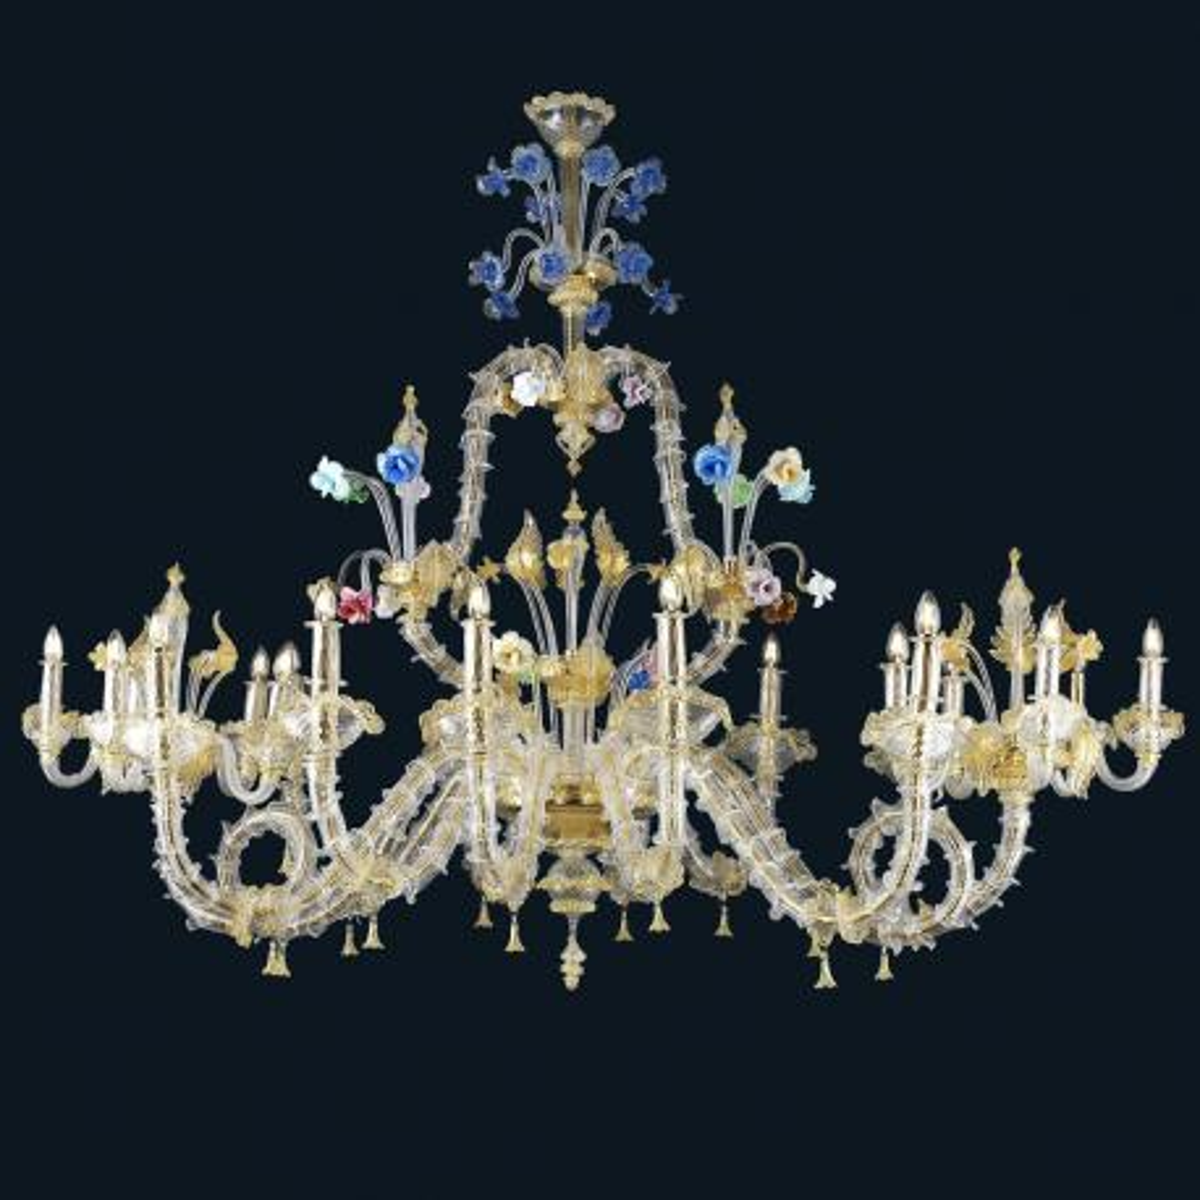 """Rea"" Murano glass chandelier - 10+5+5 lights - gold"